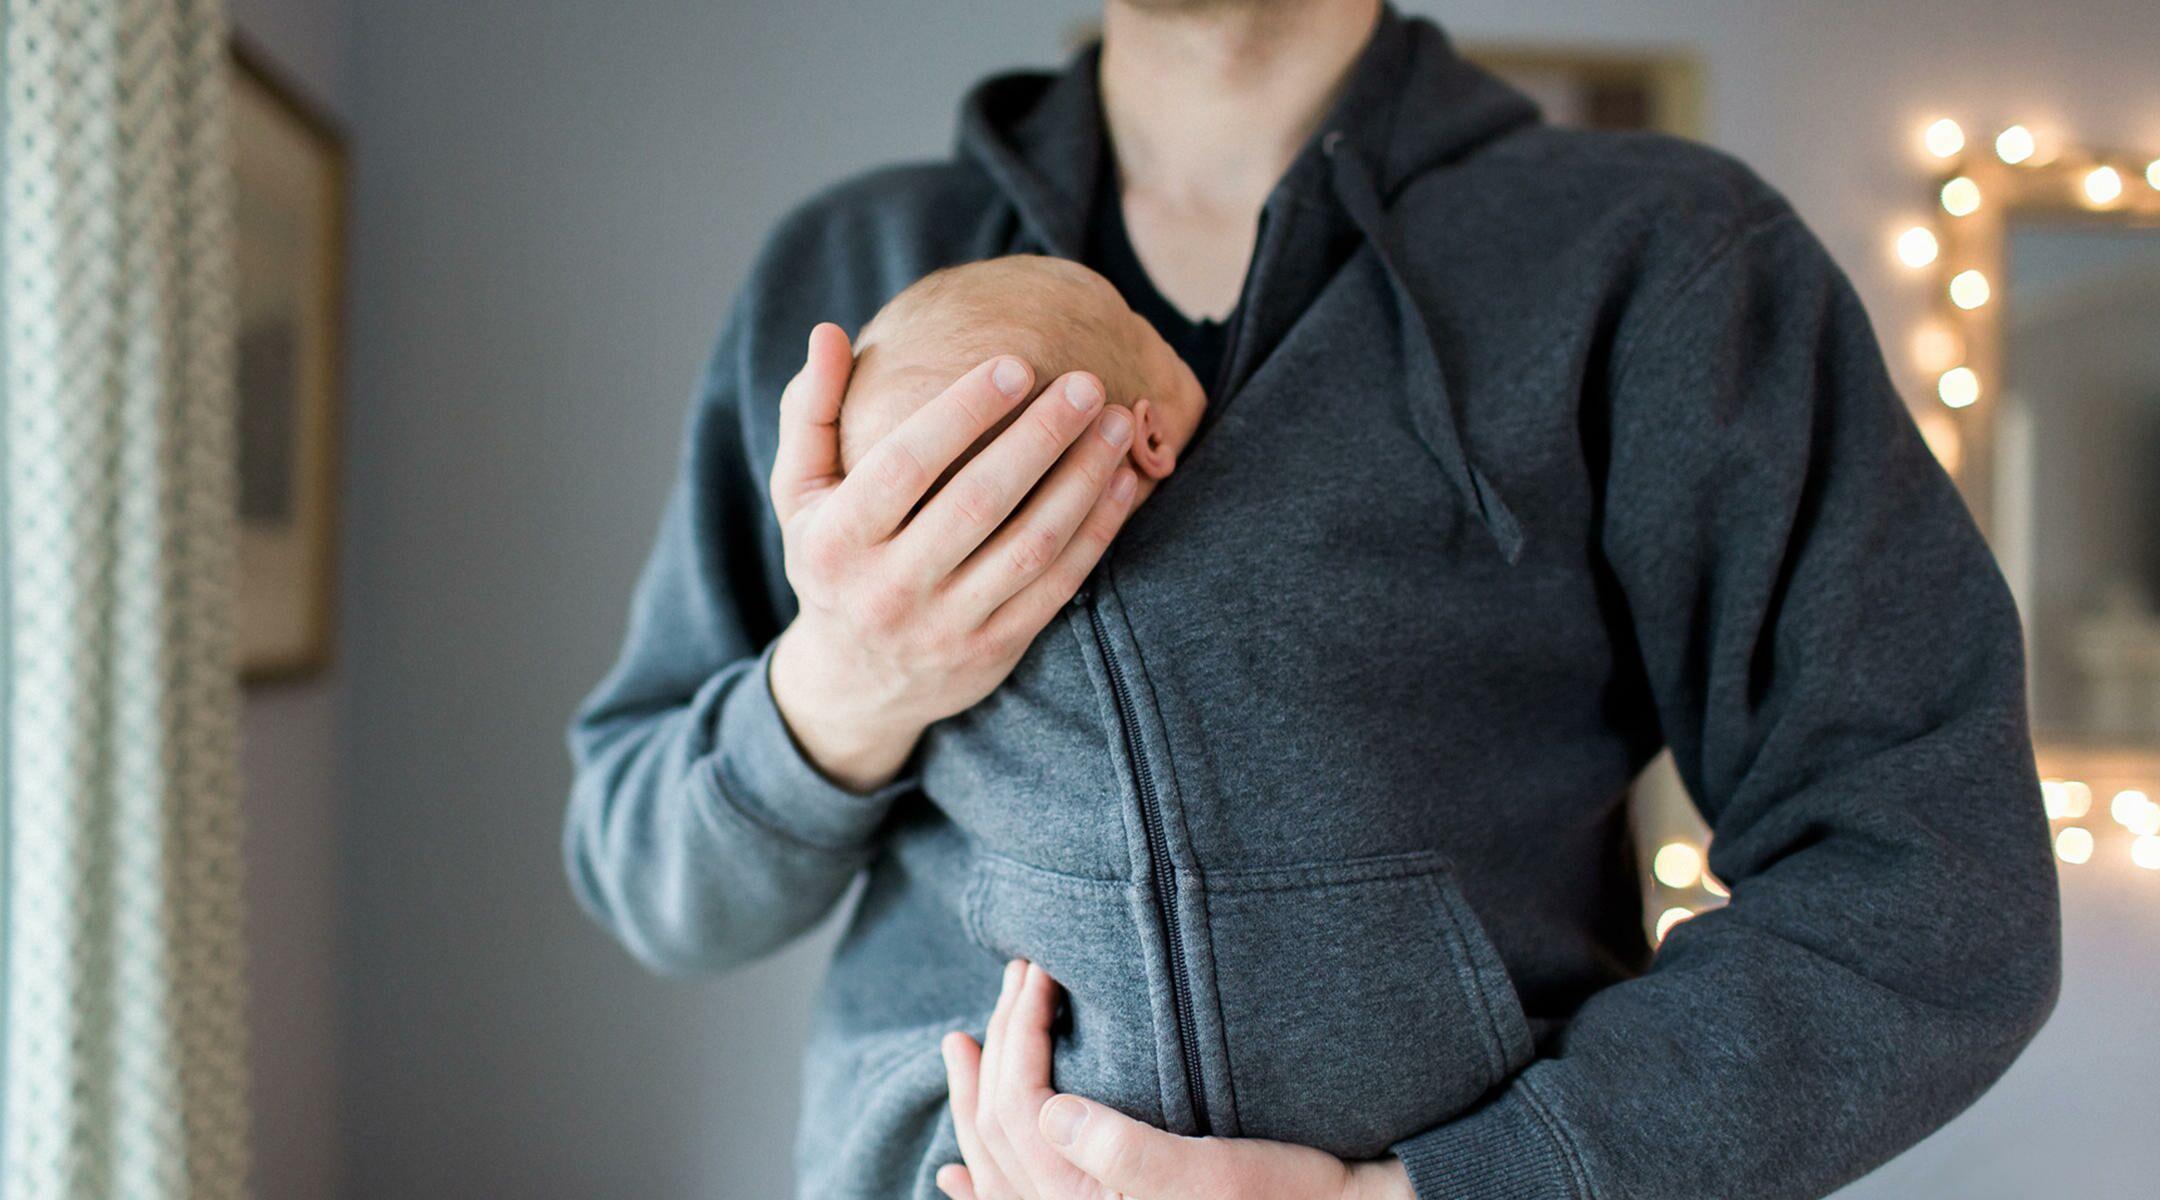 dad holding newborn inside his sweatshirt